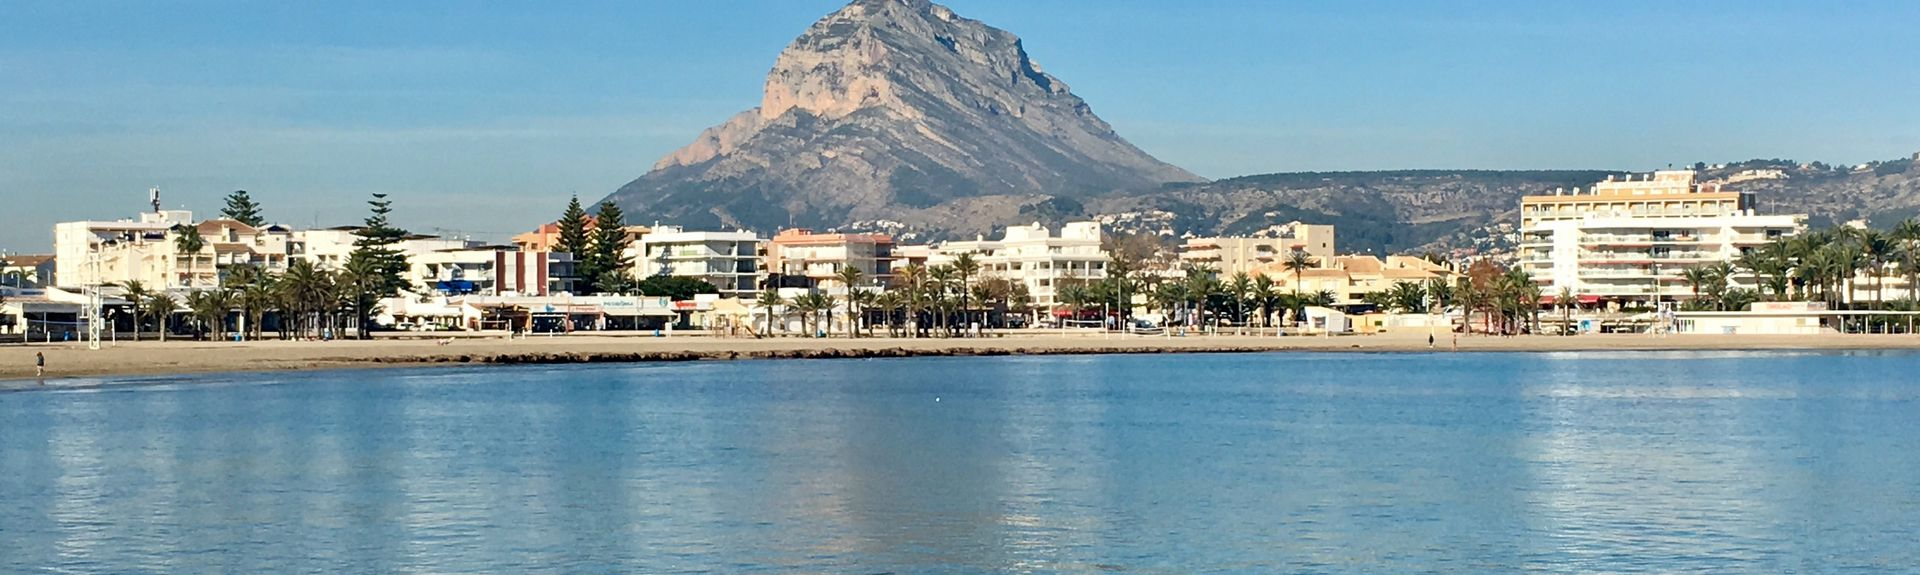 La Marina Alta, Alicante, Spain